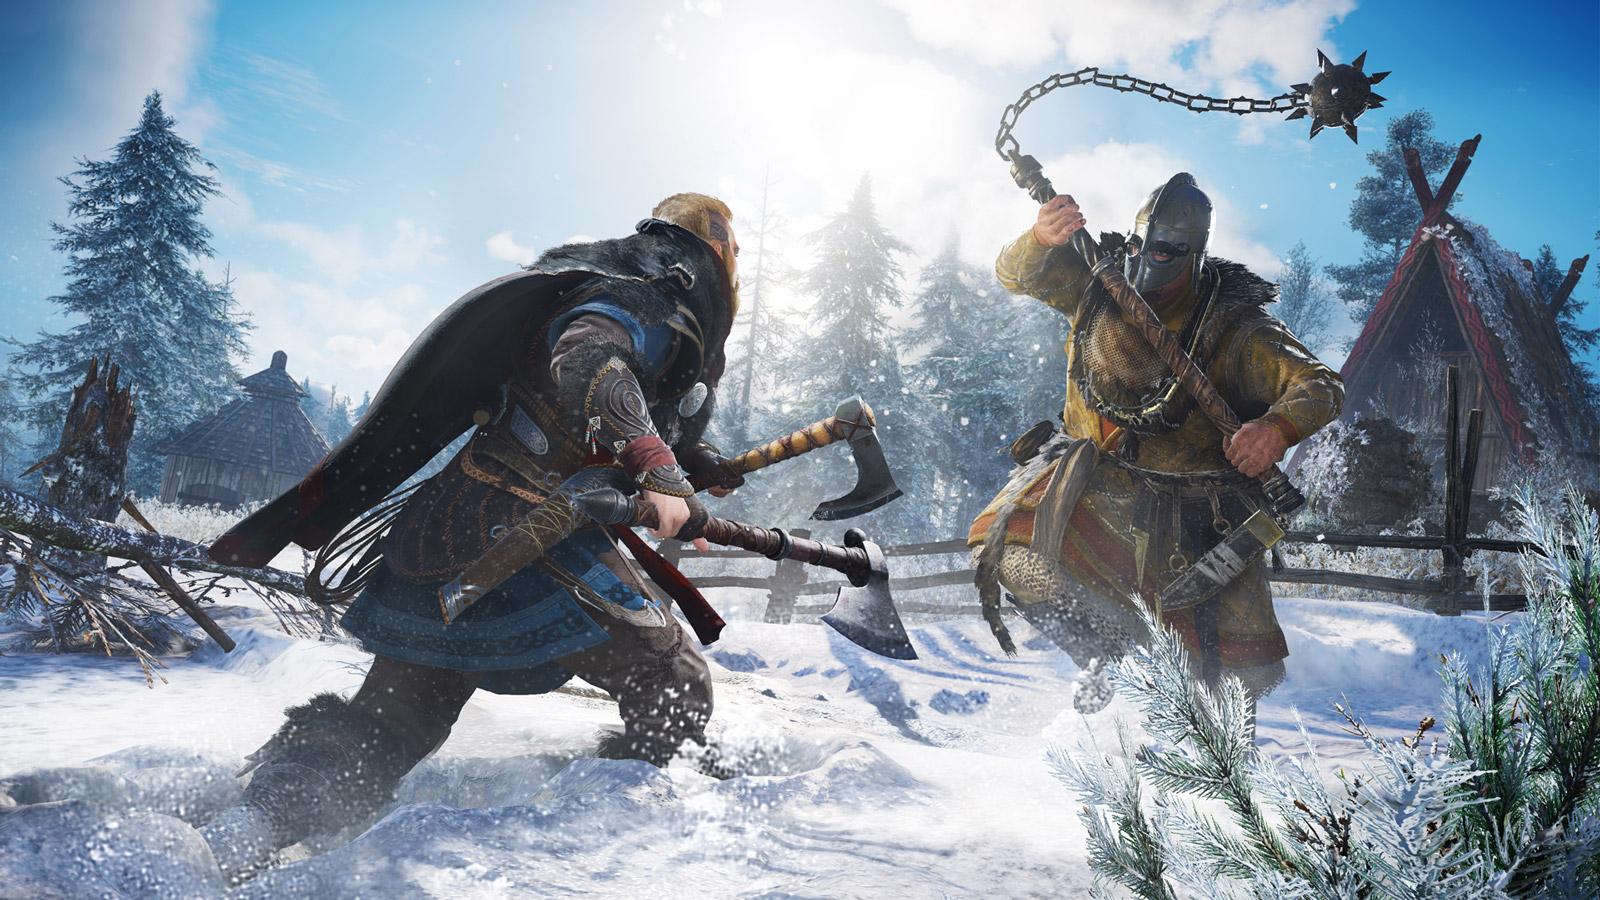 Assassin's Creed Valhalla Wallpaper in 1600x900